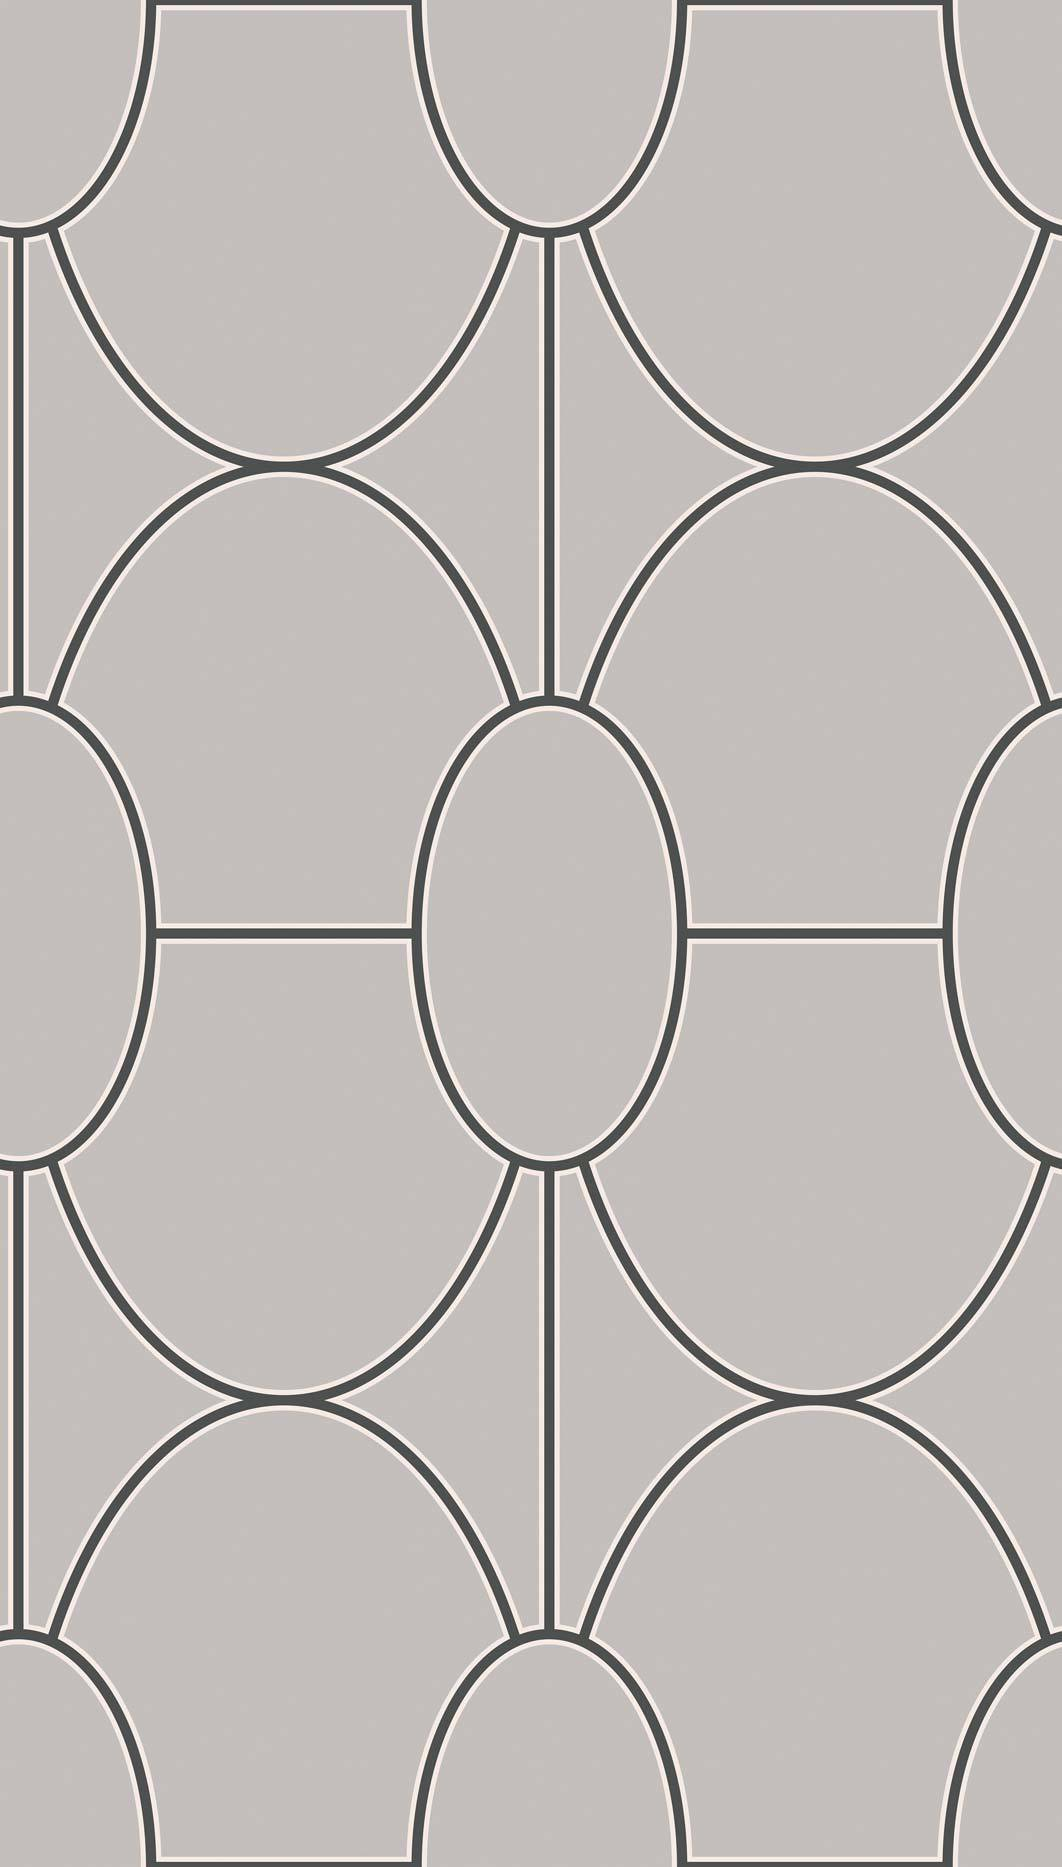 Обои Cole & Son Geometric II 105/6027, интернет магазин Волео